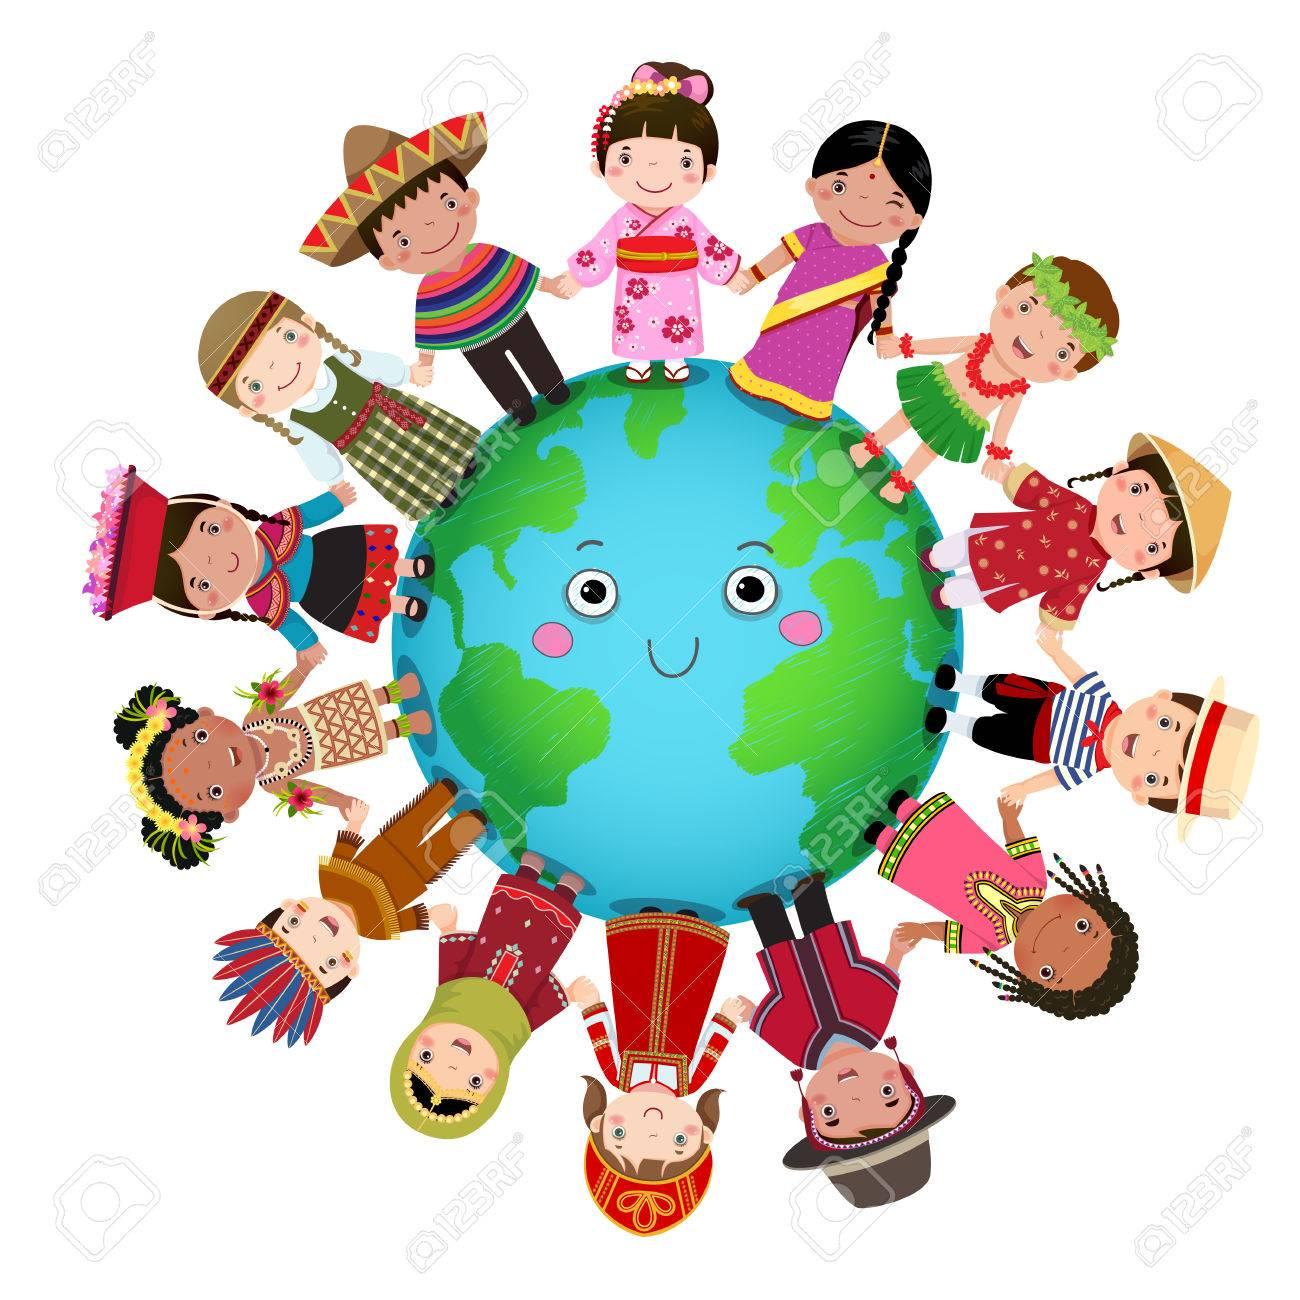 Multicultural children holding hand around the world - 79331538